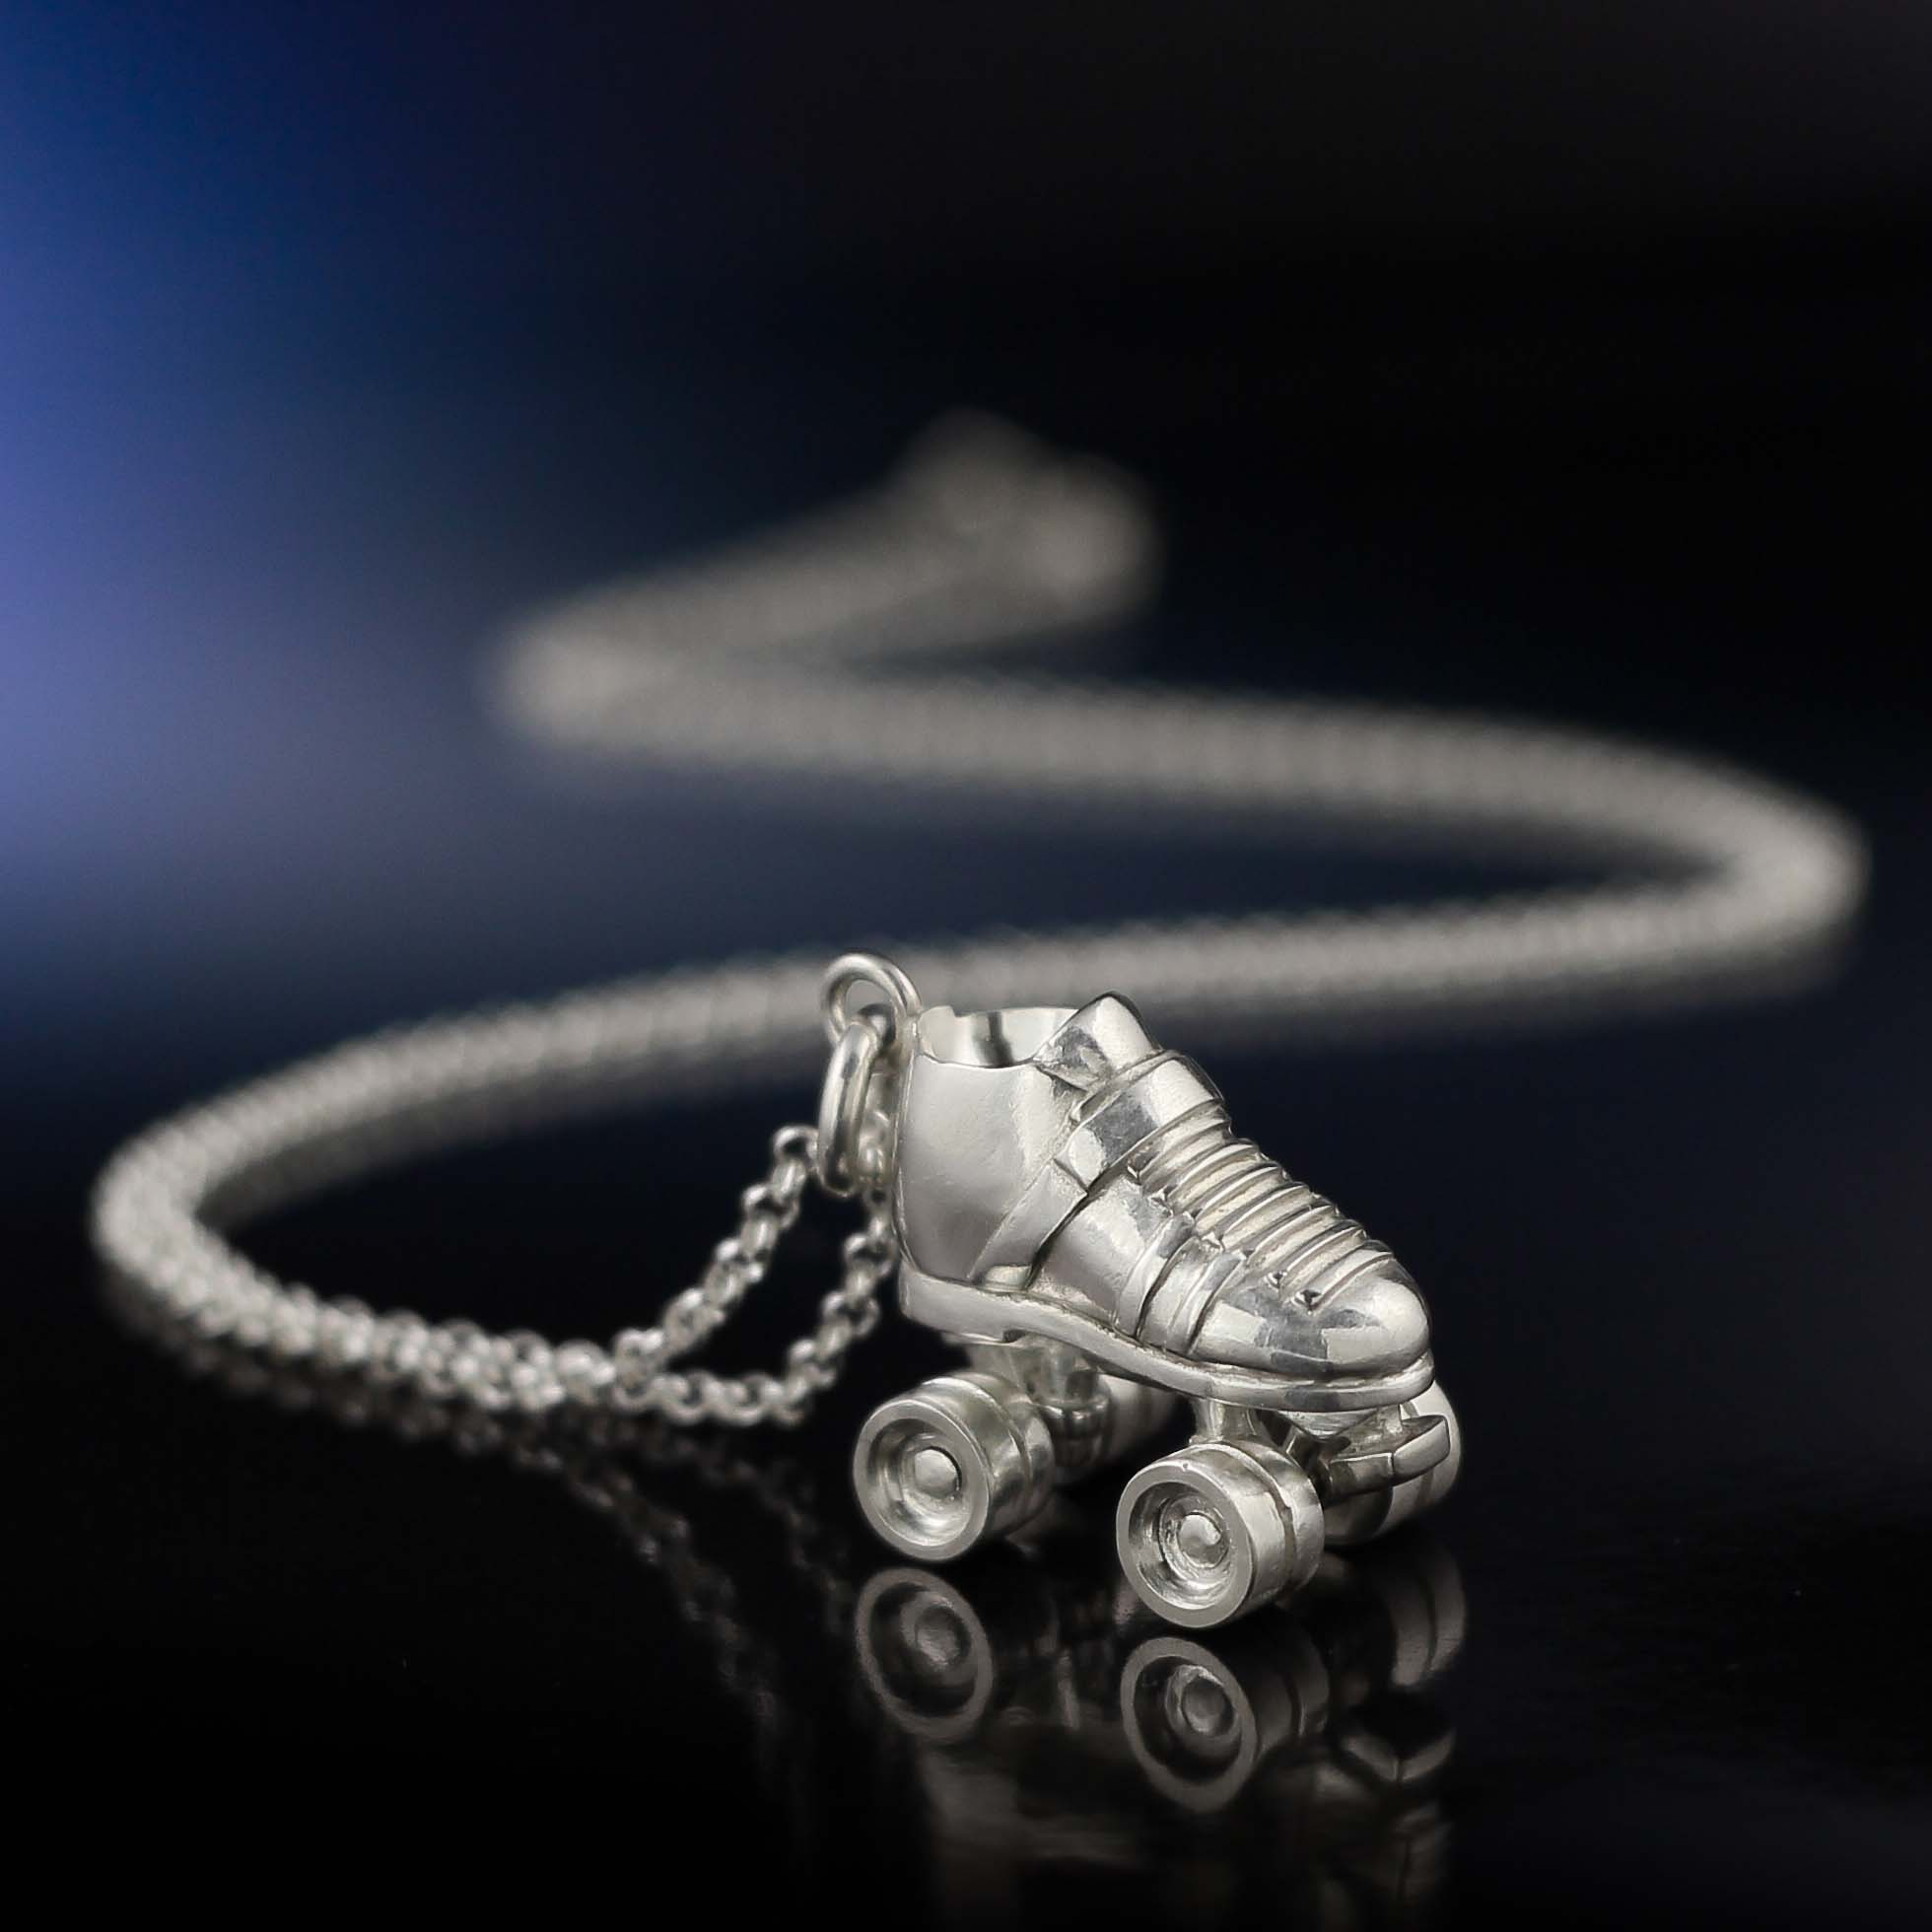 Silver roller derby necklace